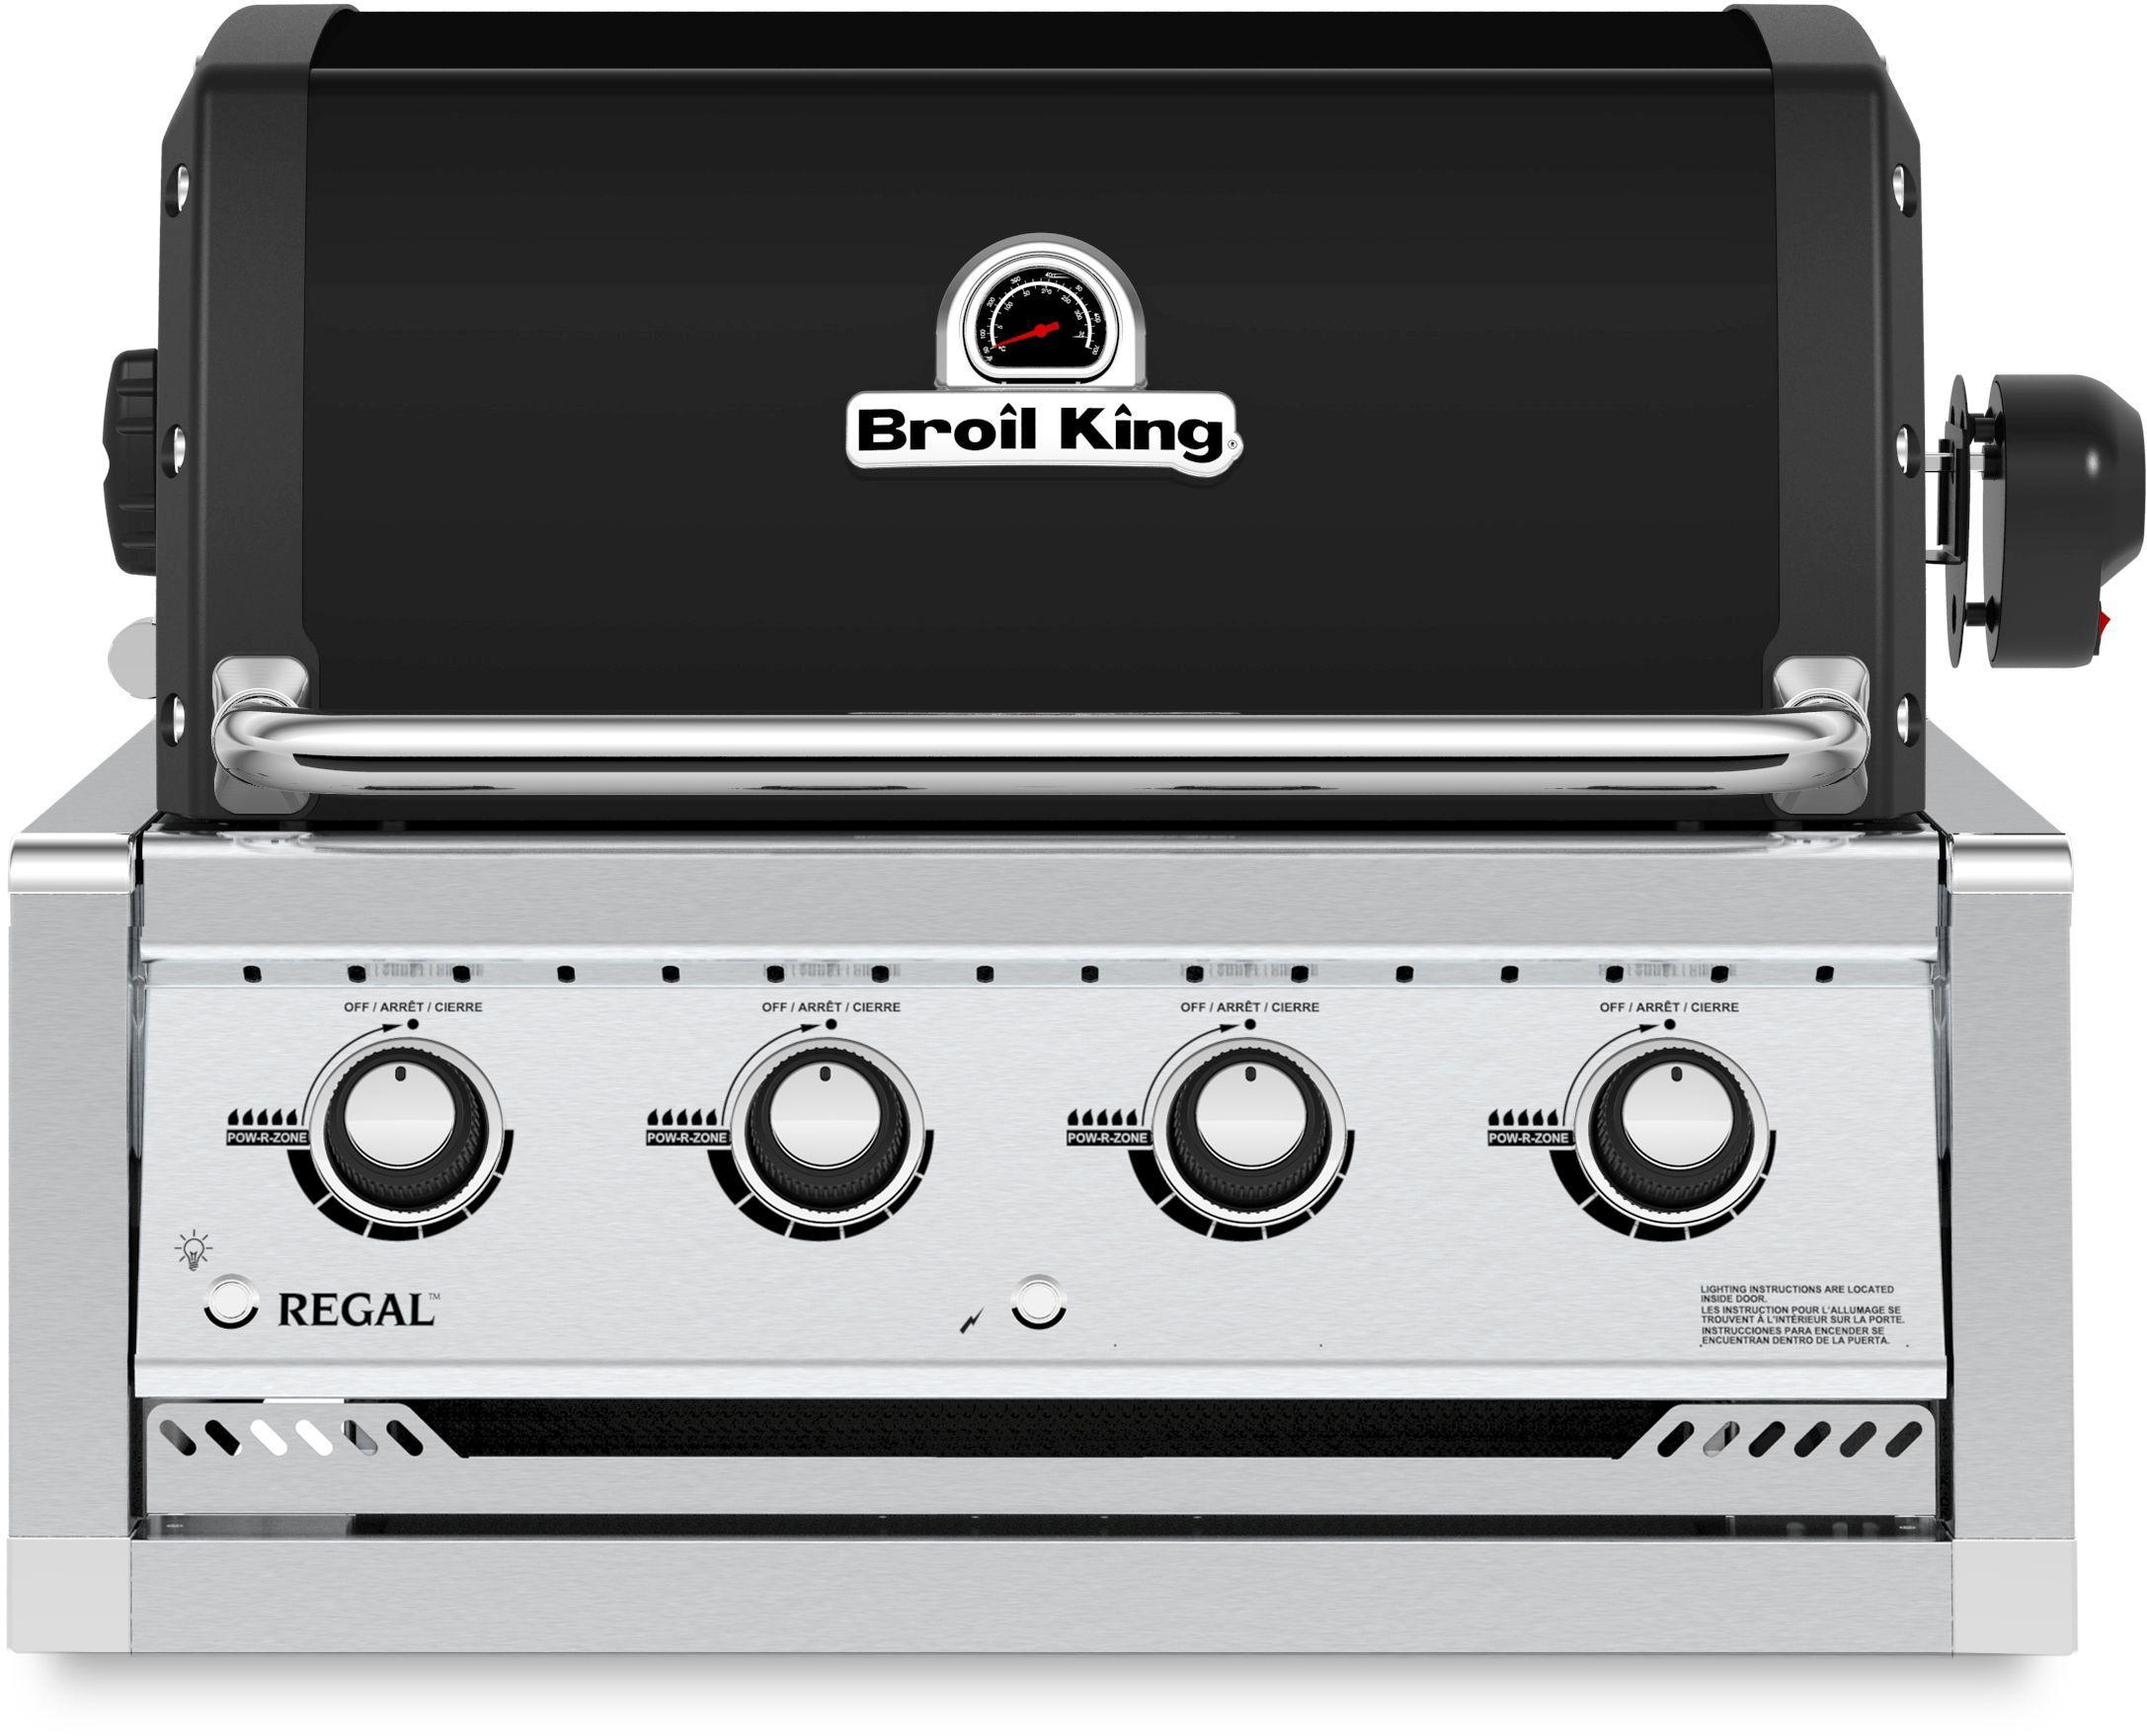 Broil King Regal S420 Built In Head 885717 Appliance Financing Fuel Filter